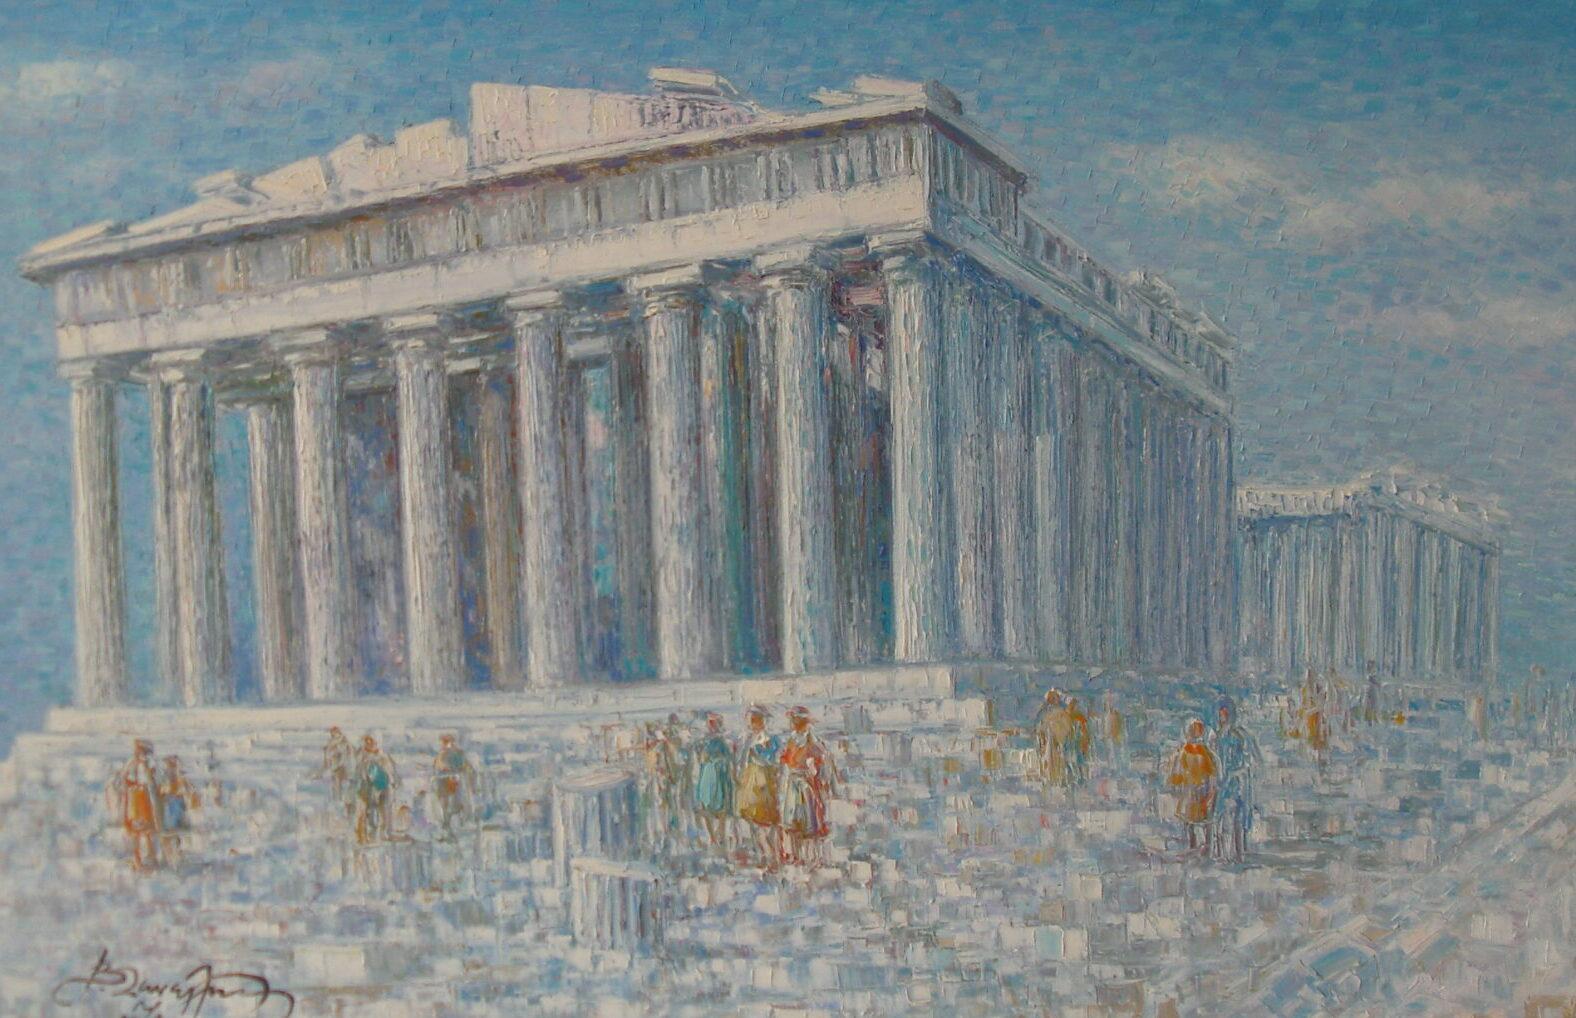 THE BEACON OF CIVILISATION STILL SHINES ON THE ACROPOLIS, ATHENS